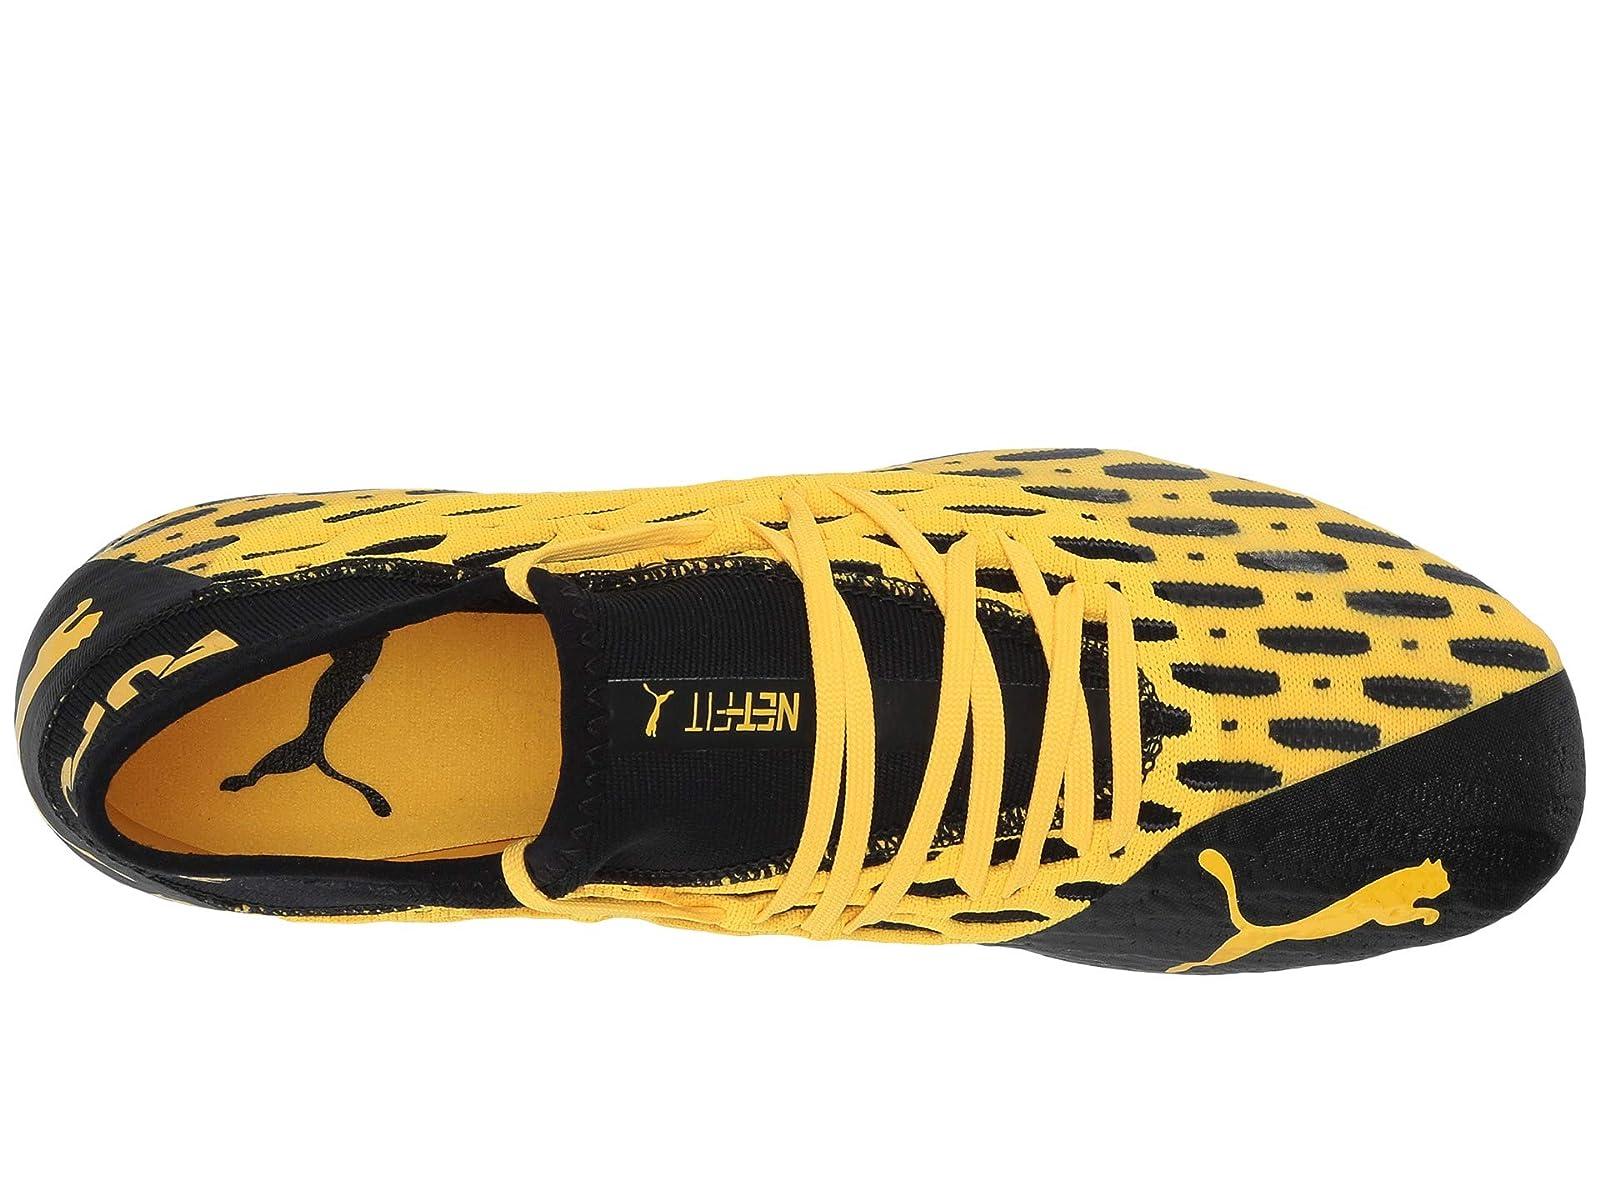 Man-039-s-Sneakers-amp-Athletic-Shoes-PUMA-Future-5-2-Netfit-FG-AG thumbnail 17